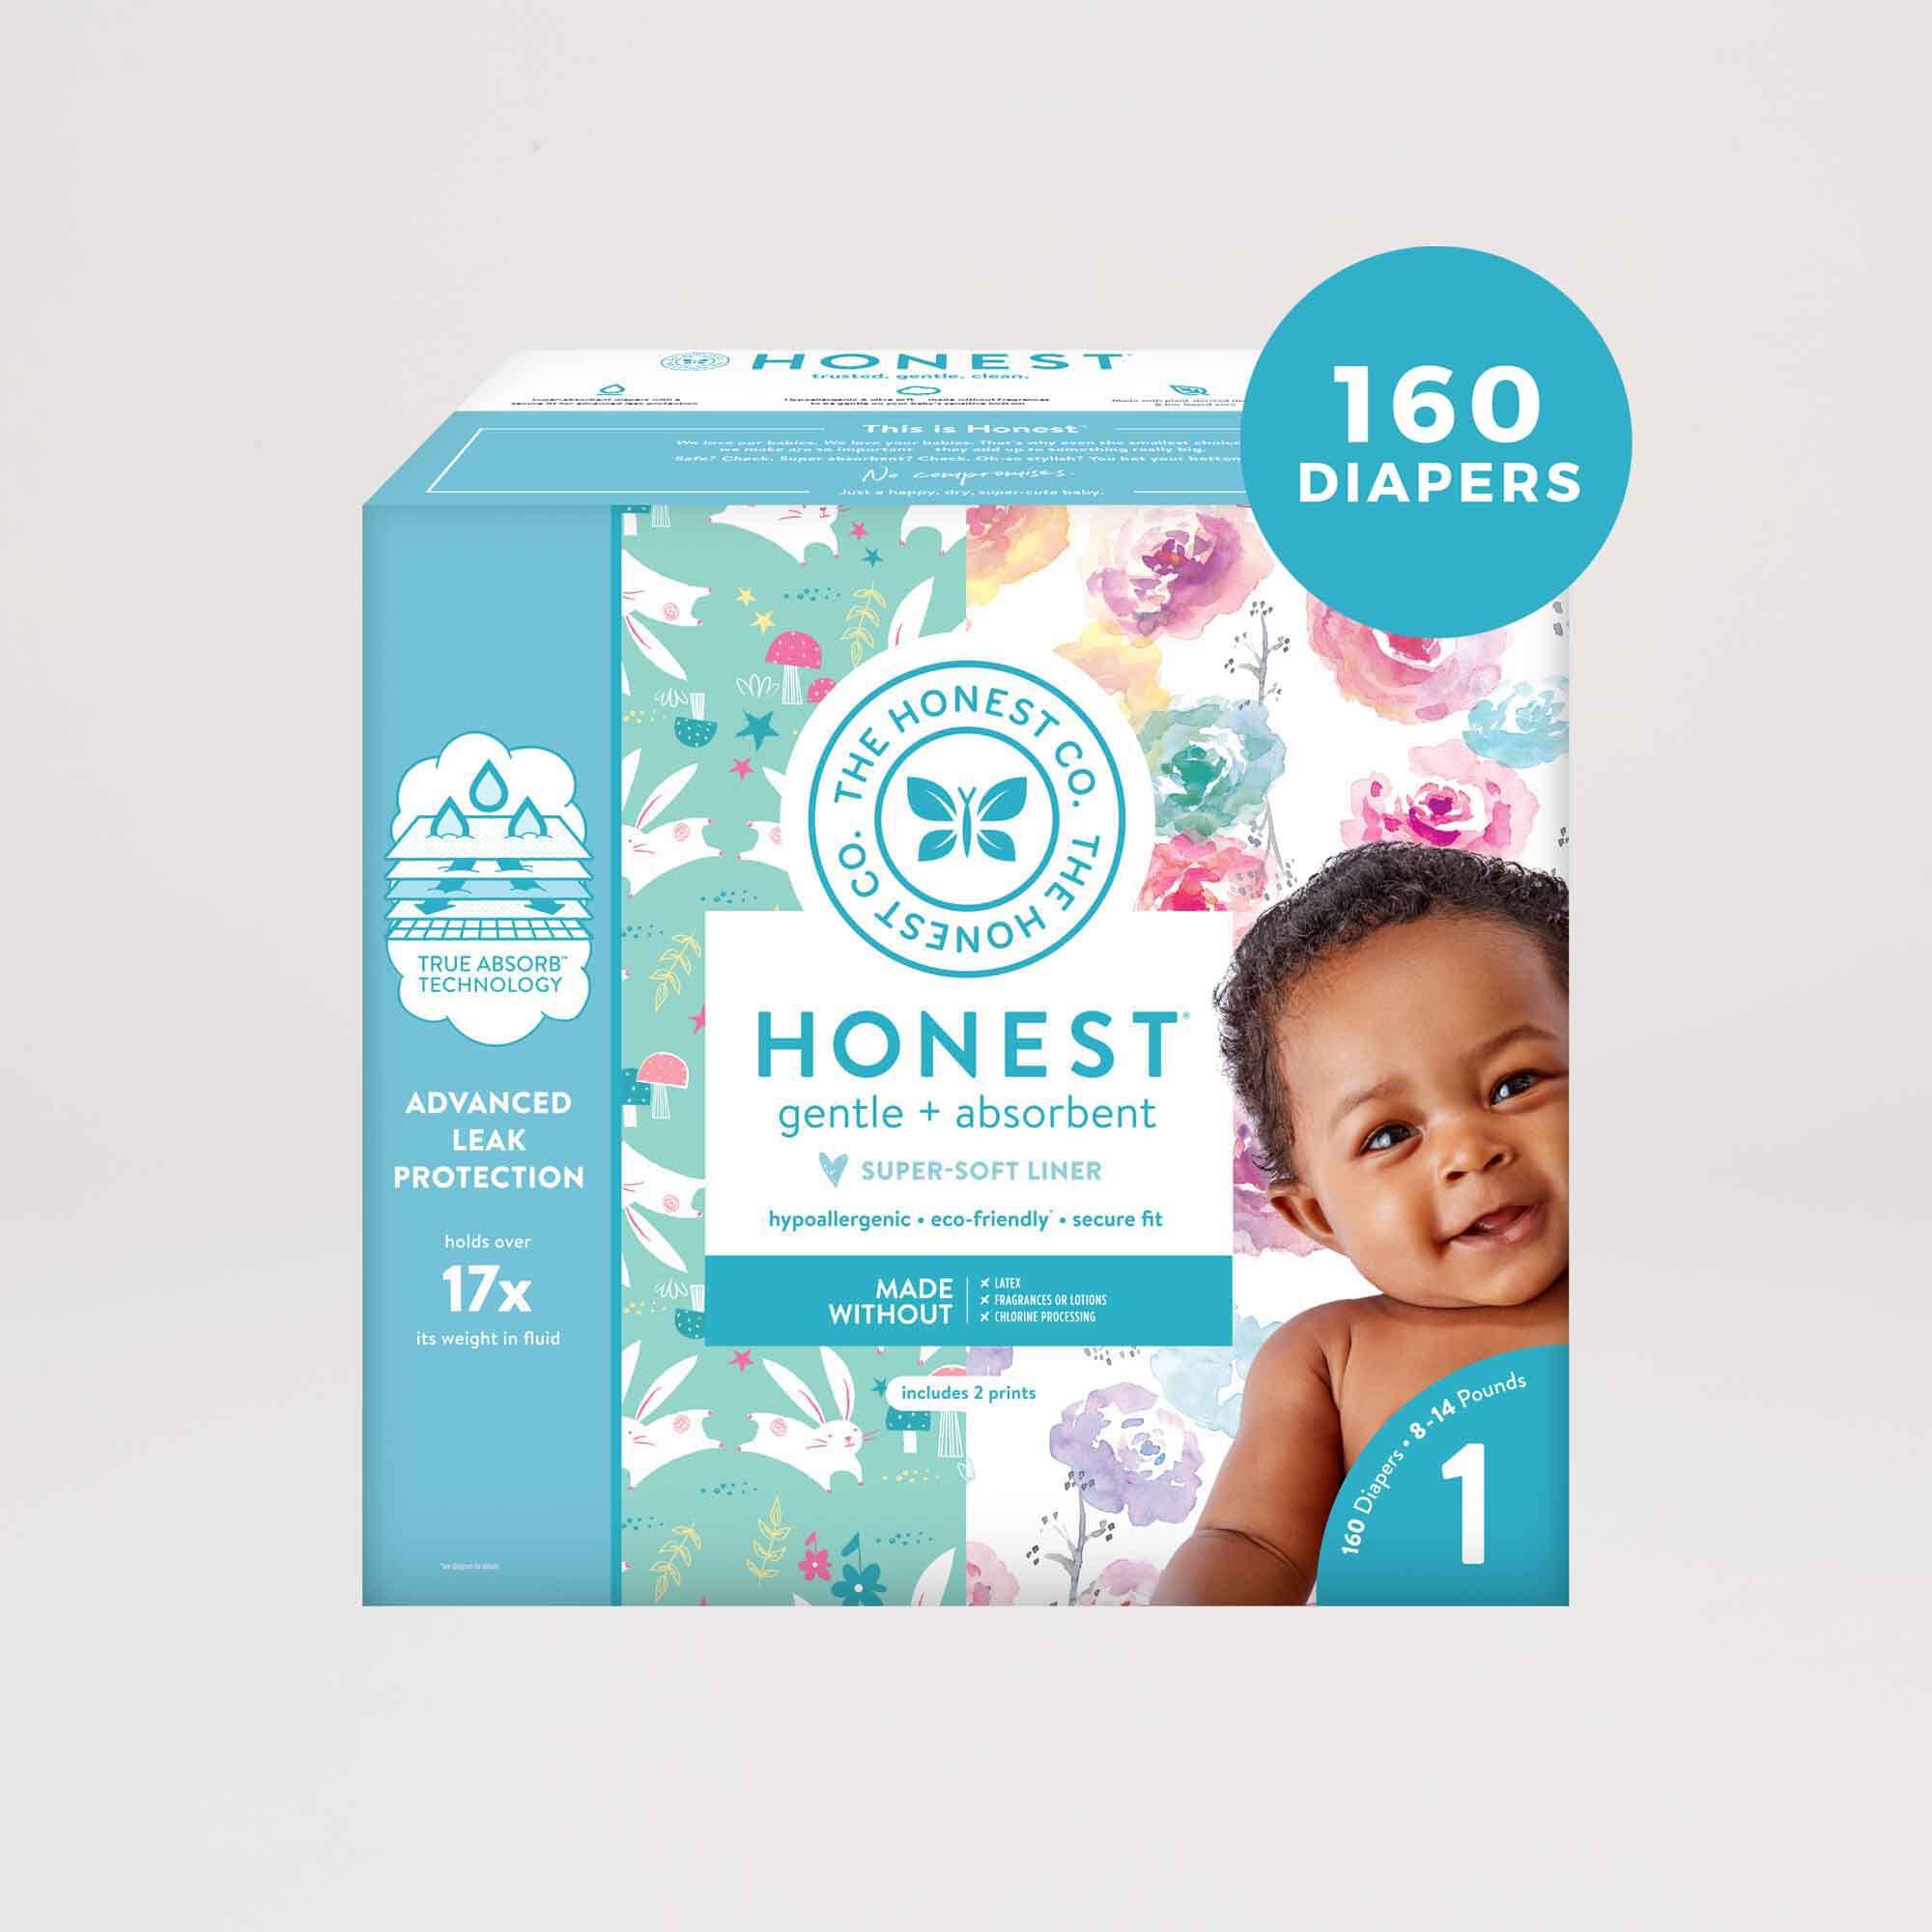 Rose Blossoms/Bunnies Diaper Box